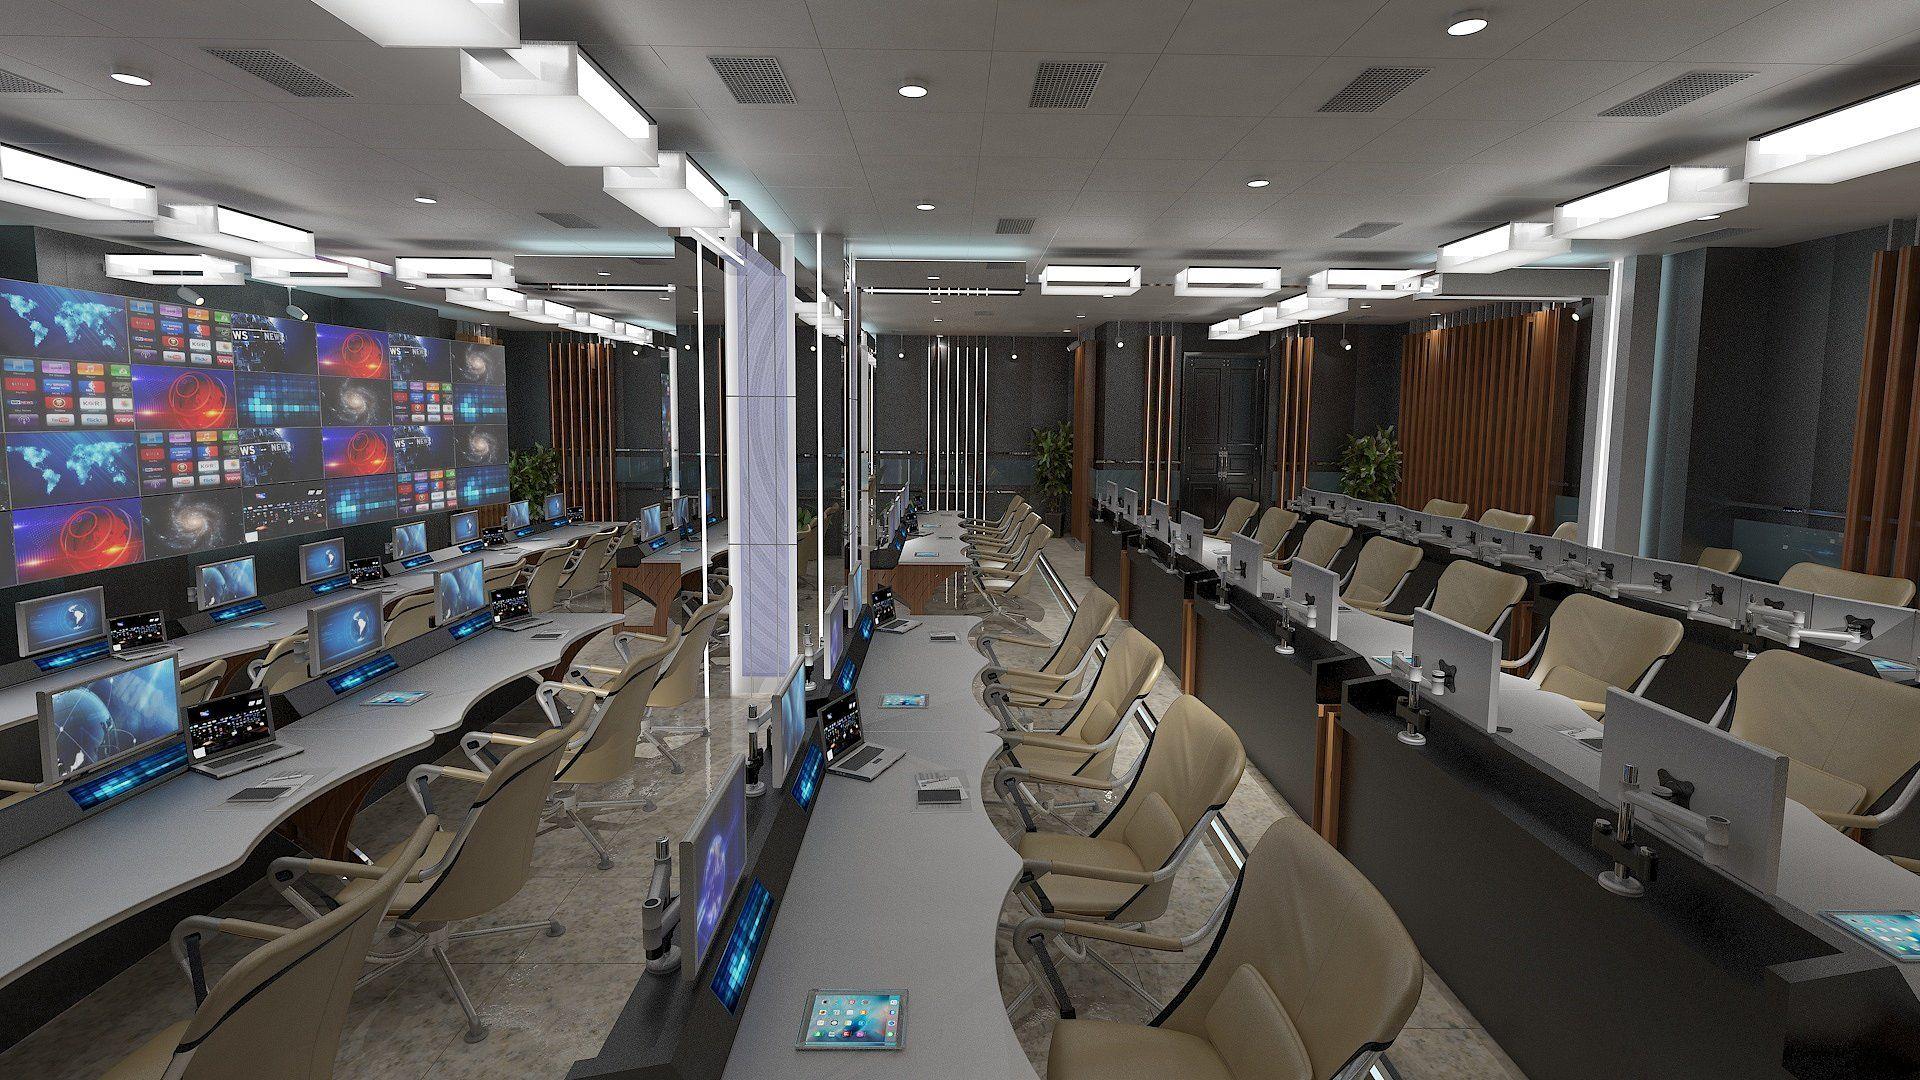 TV Studio Control Room 1 Studio, 3d model, 3d architecture